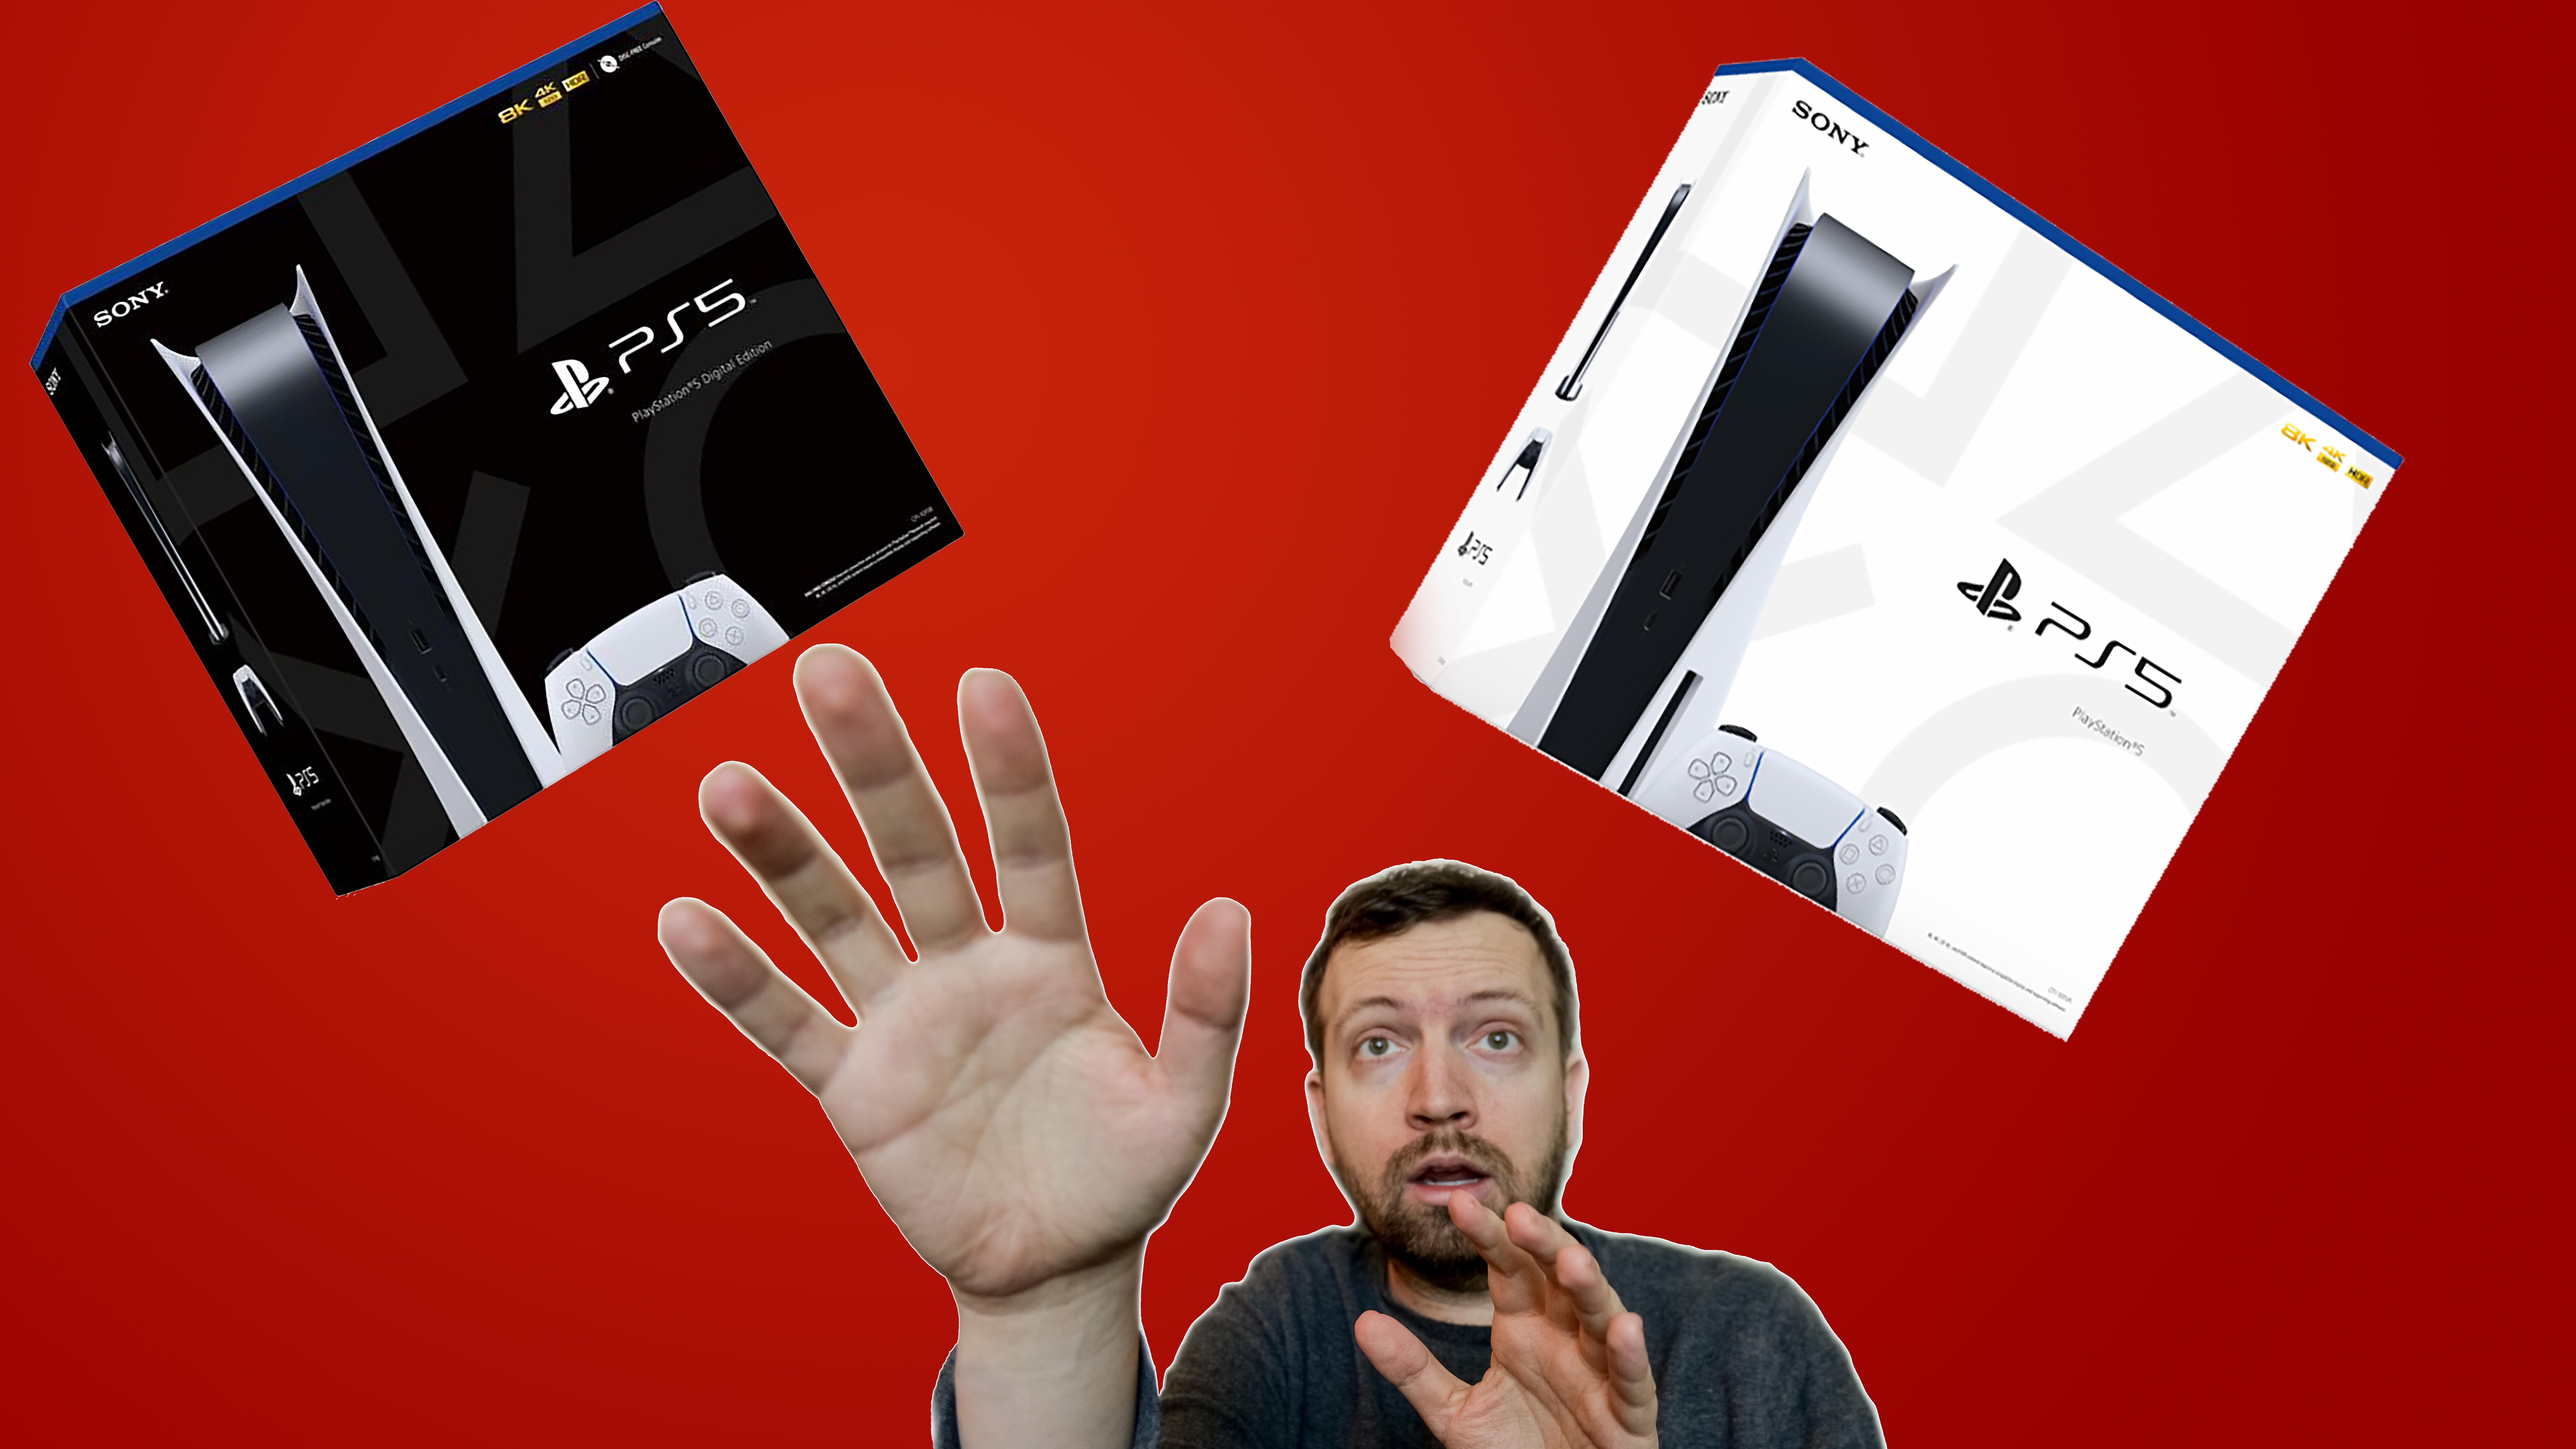 PS5 restock Matt Swider